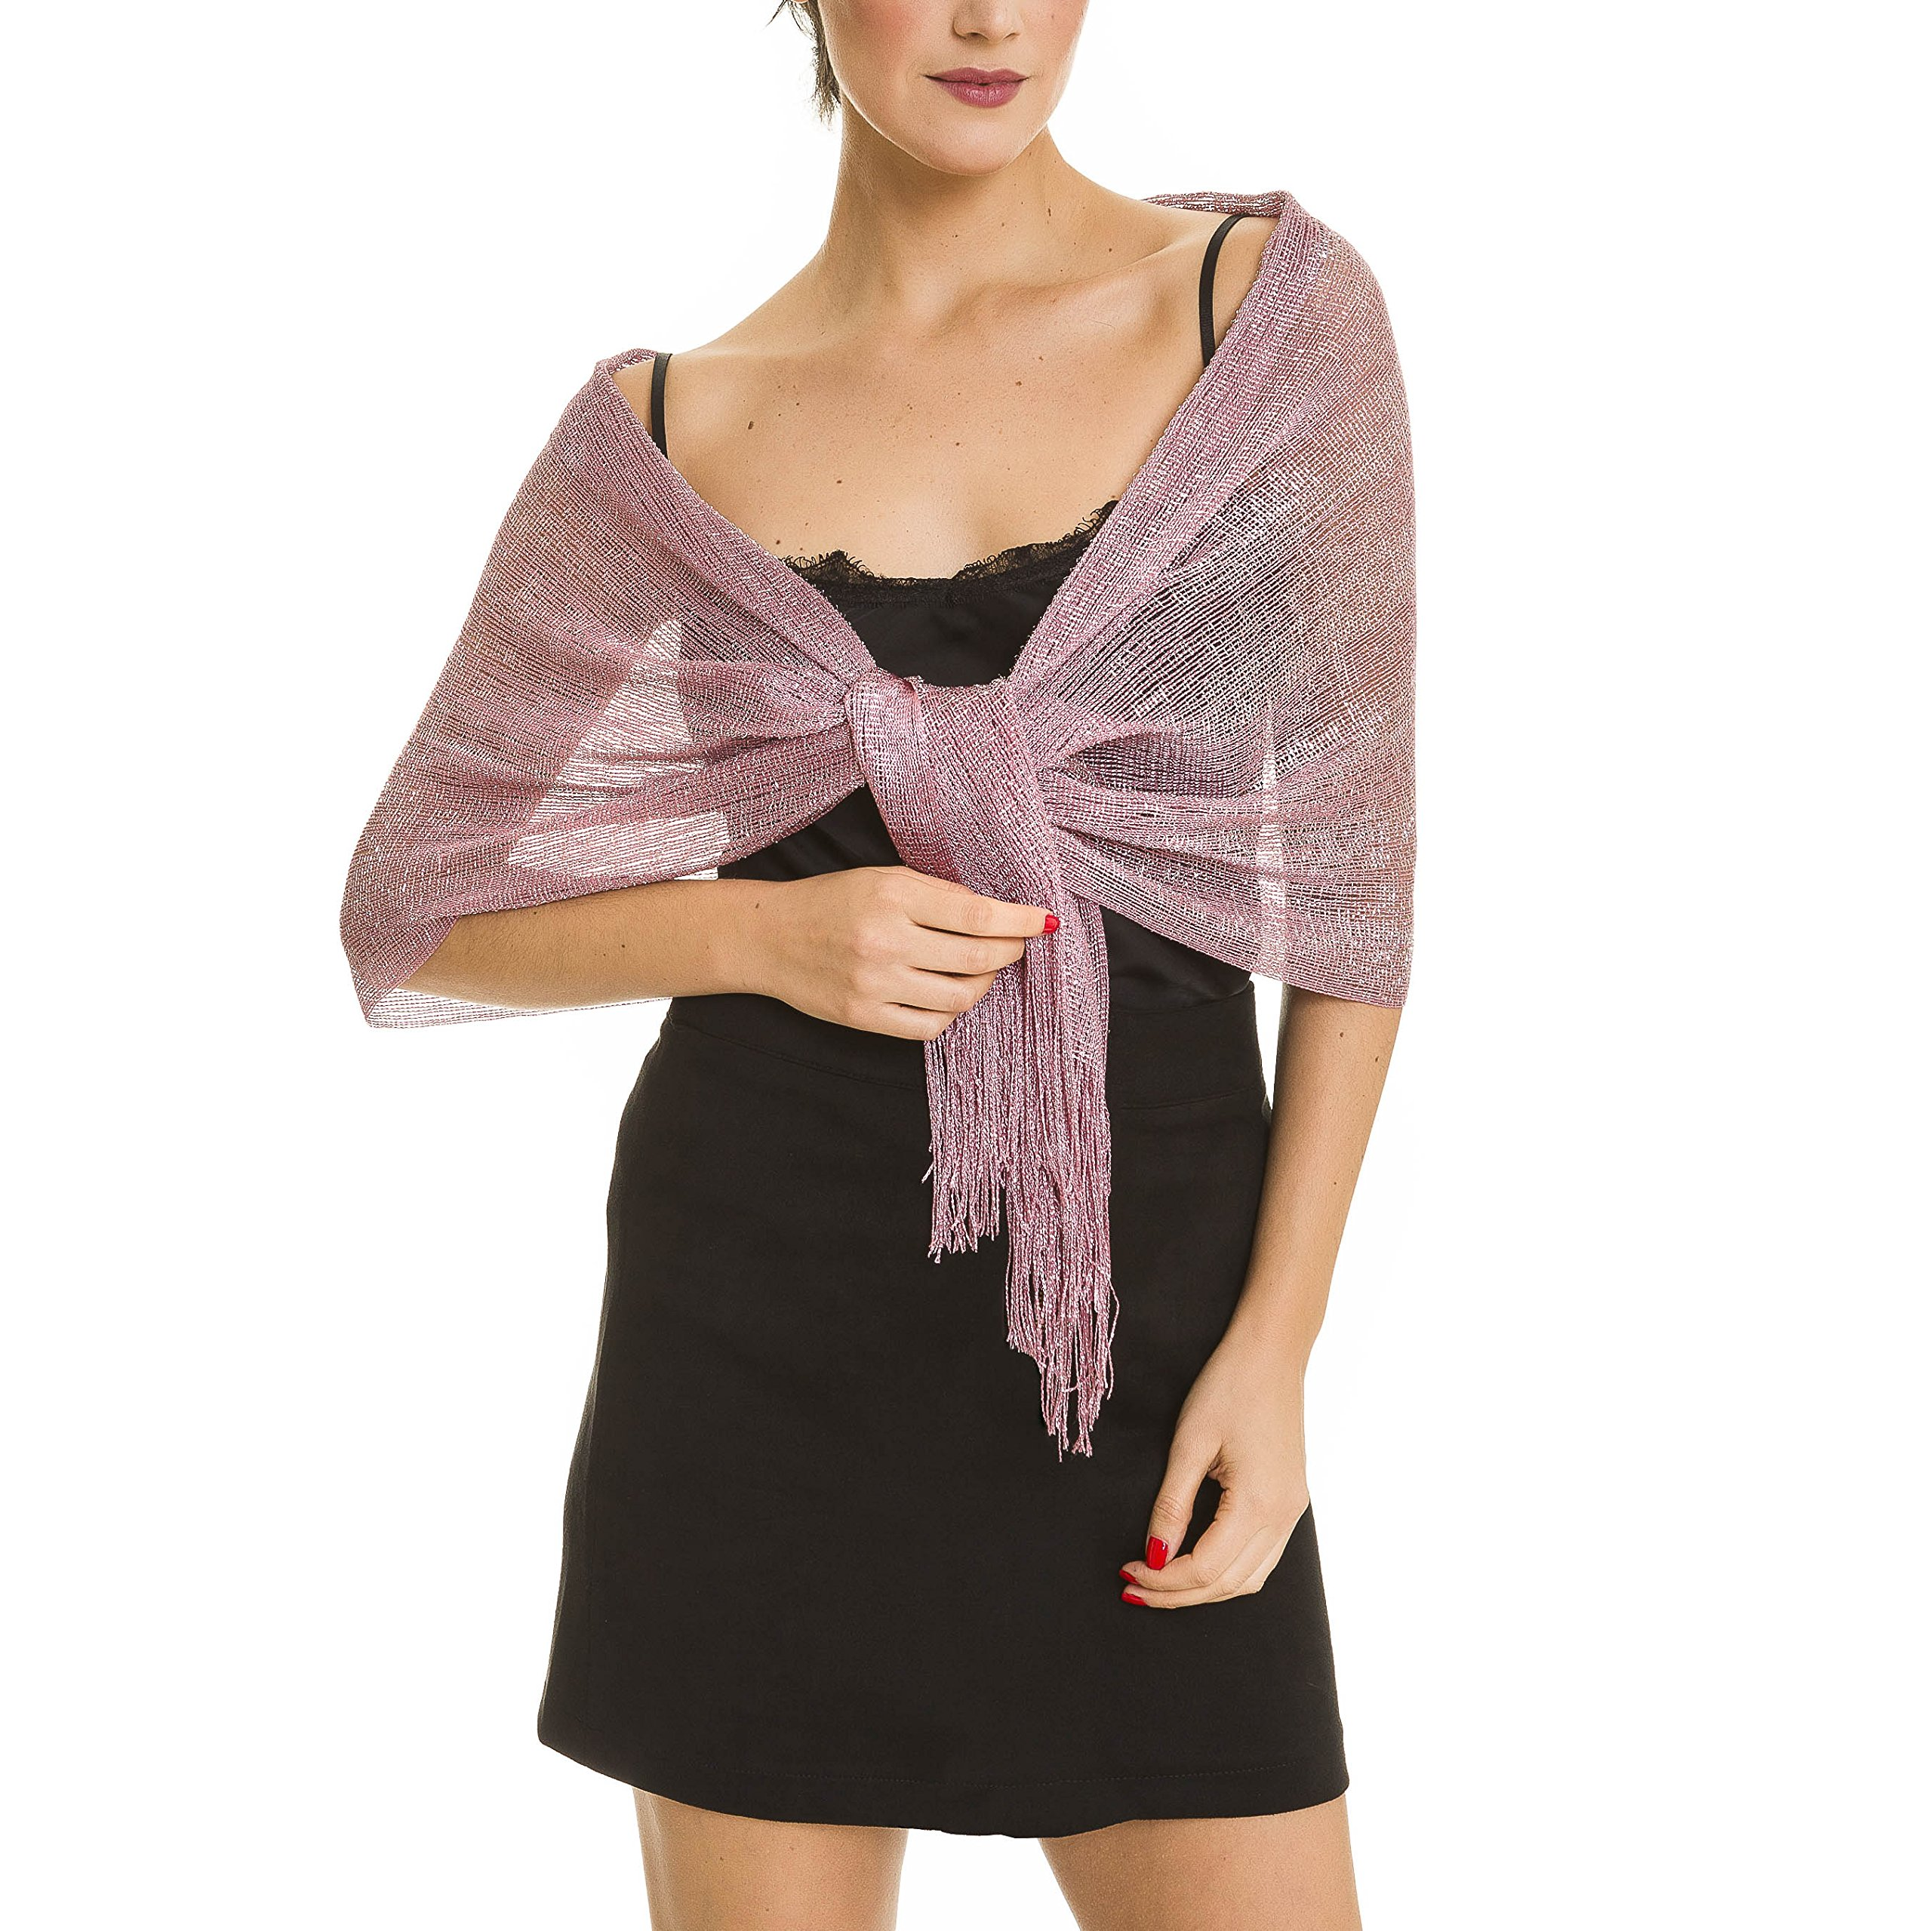 Shawl Wrap Fashion Scarf for Women Summer Fall: Evening Dresses, Wedding, Party, Bridal (Pink IV)